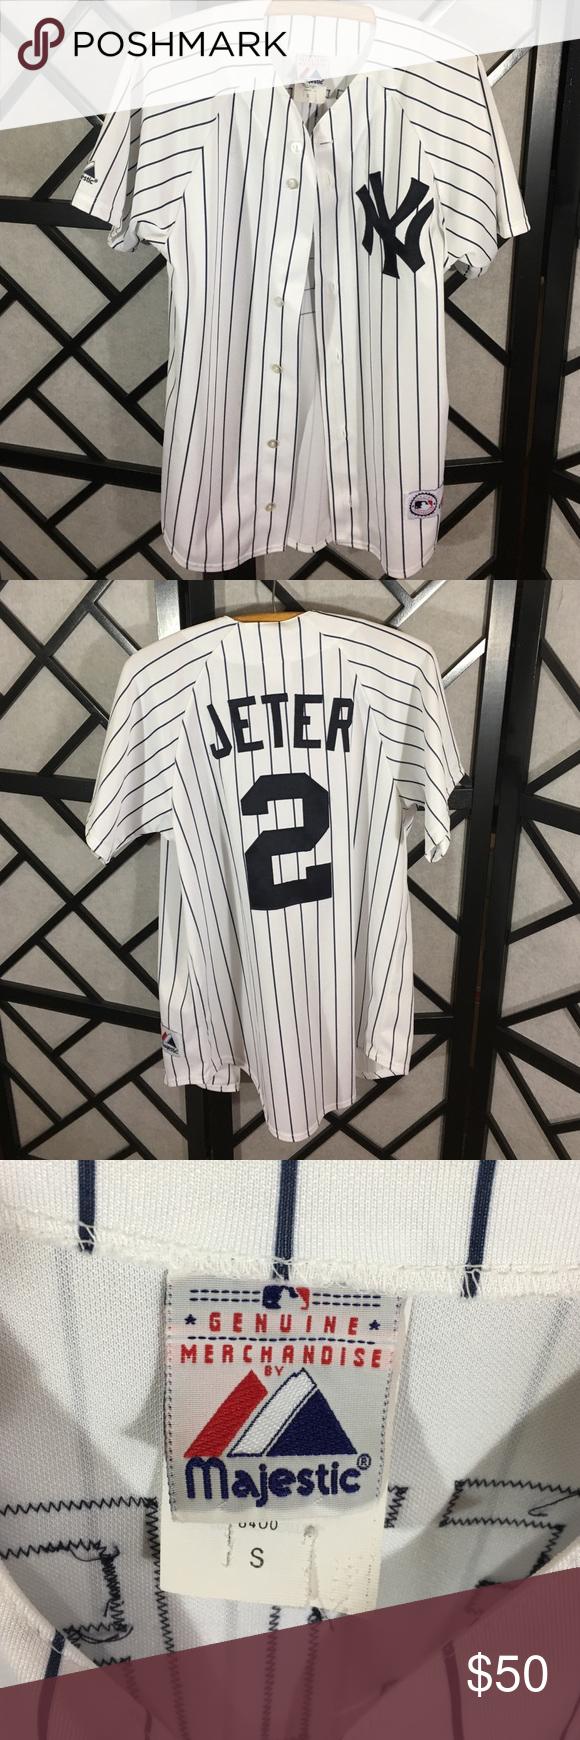 679e55ff ... get majestic new york yankees jersey shirt perfect perfect condition  majestic shirts maillot de baseball b066f